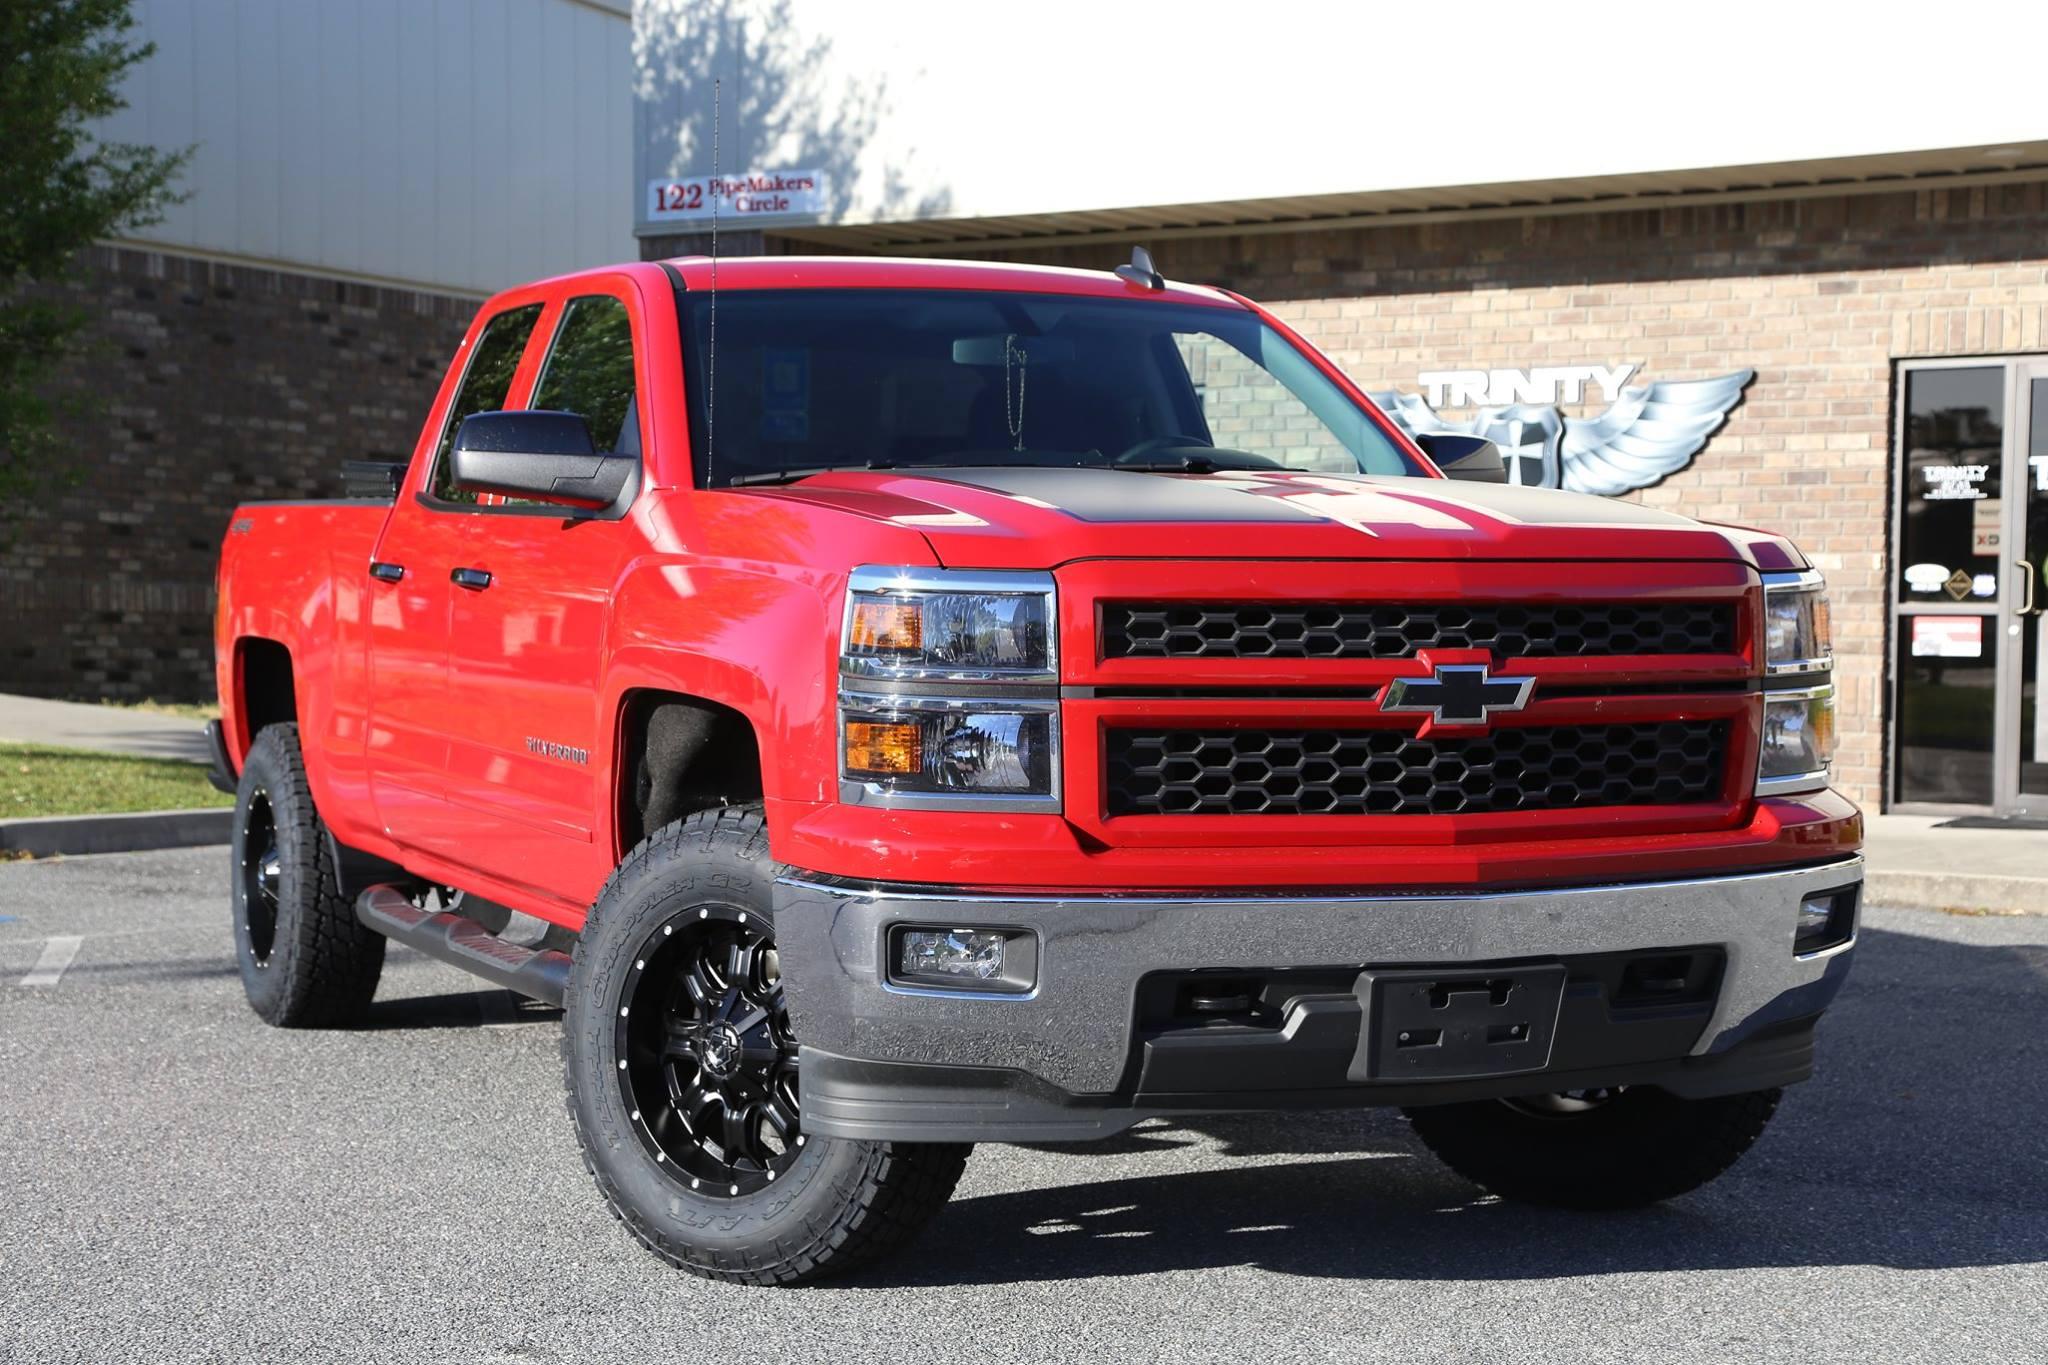 2015 Silverado 4wd 3 5inch lift on TIS wheels Trinity Motorsports